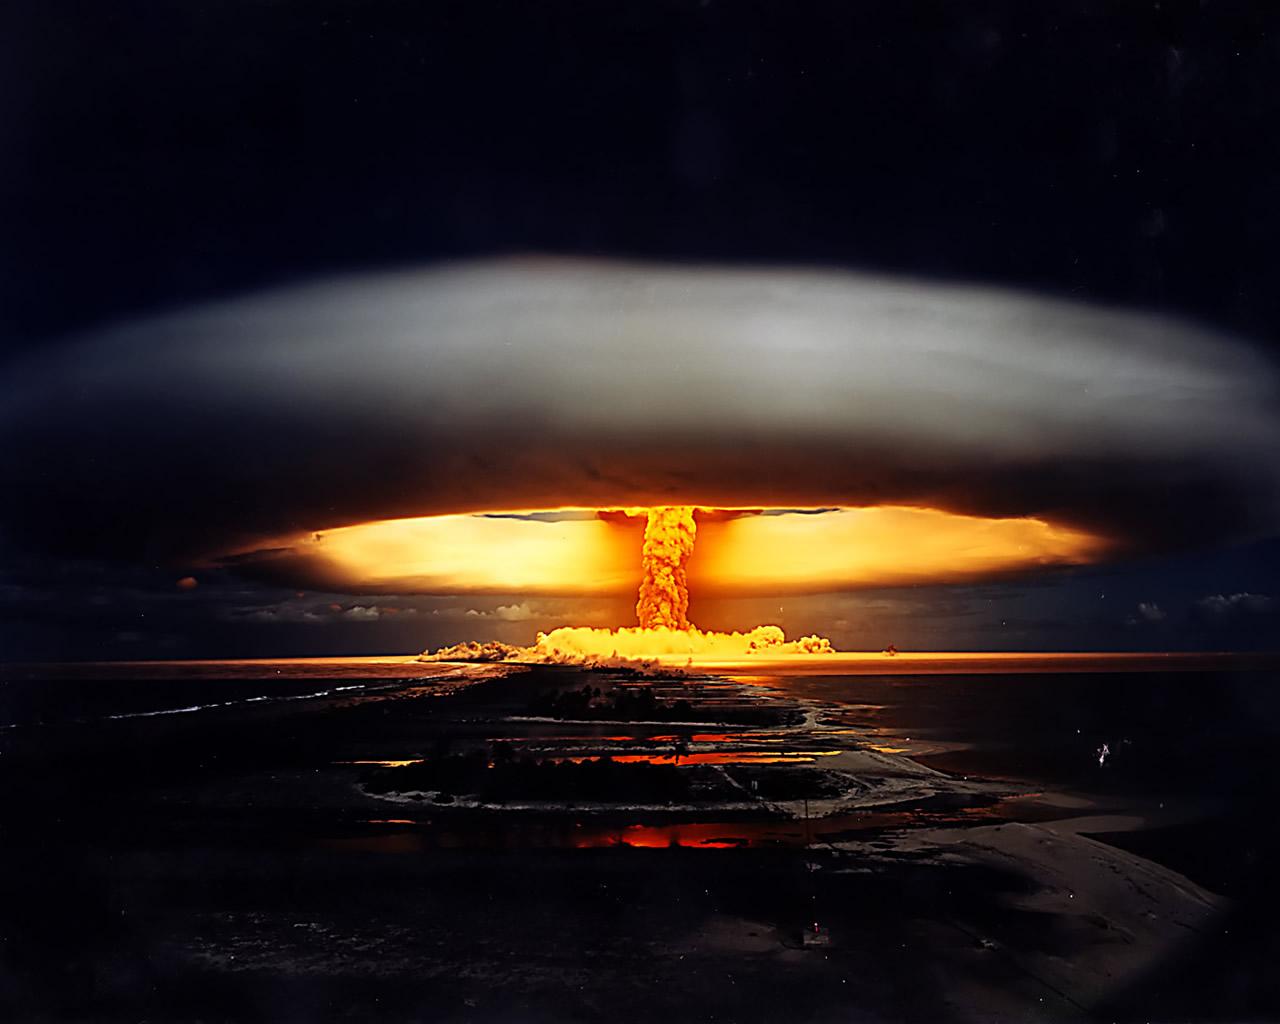 http://1.bp.blogspot.com/--nlDl4LKlK0/TlFkyVAD6oI/AAAAAAAAAE4/0s6SNWiZSz4/s1600/Explosion%20Nuclear.jpg